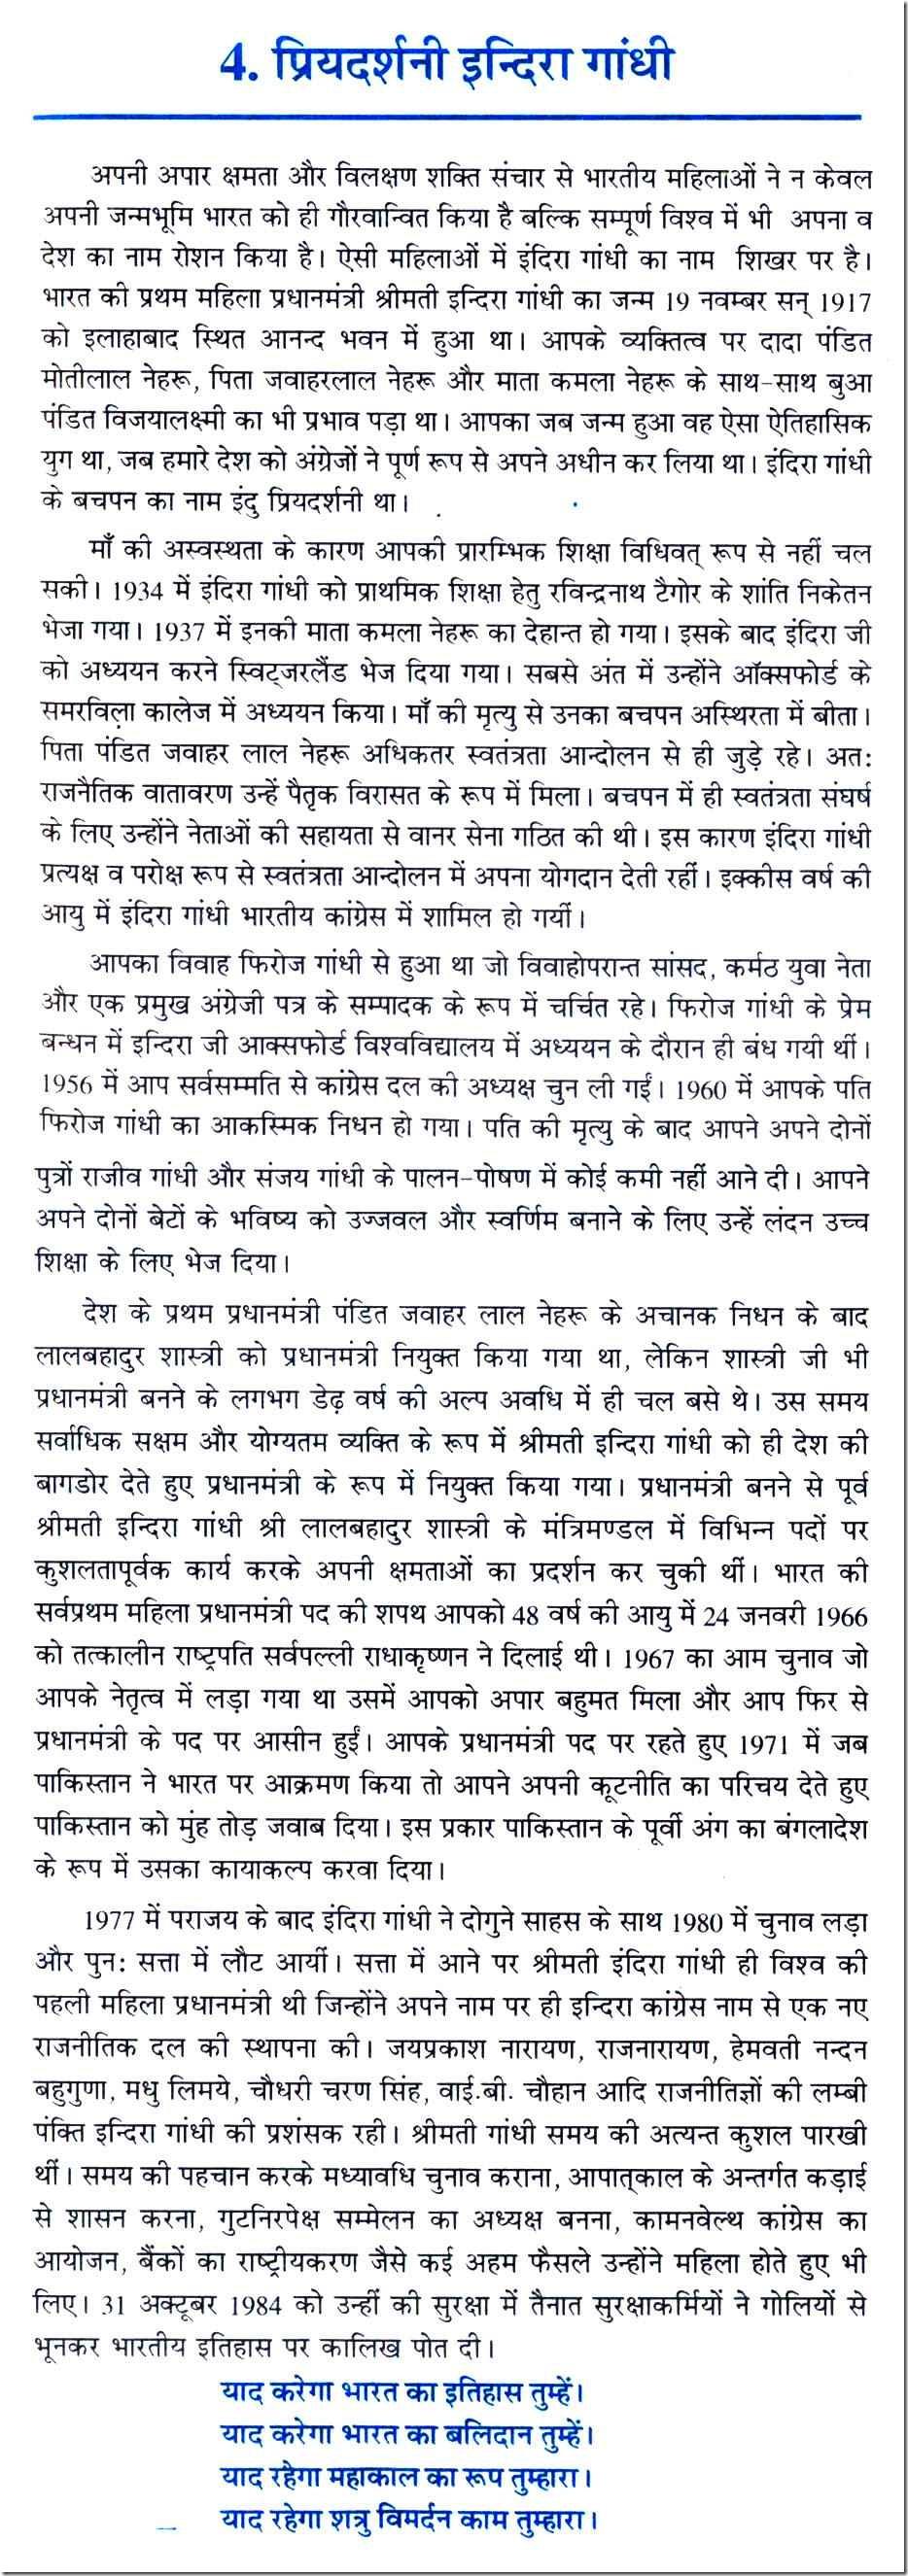 013 Mahatma Gandhi Essay In Urdu Example Questions Mfacourses887webfc2com L Imposing Language Jayanti Speech Full